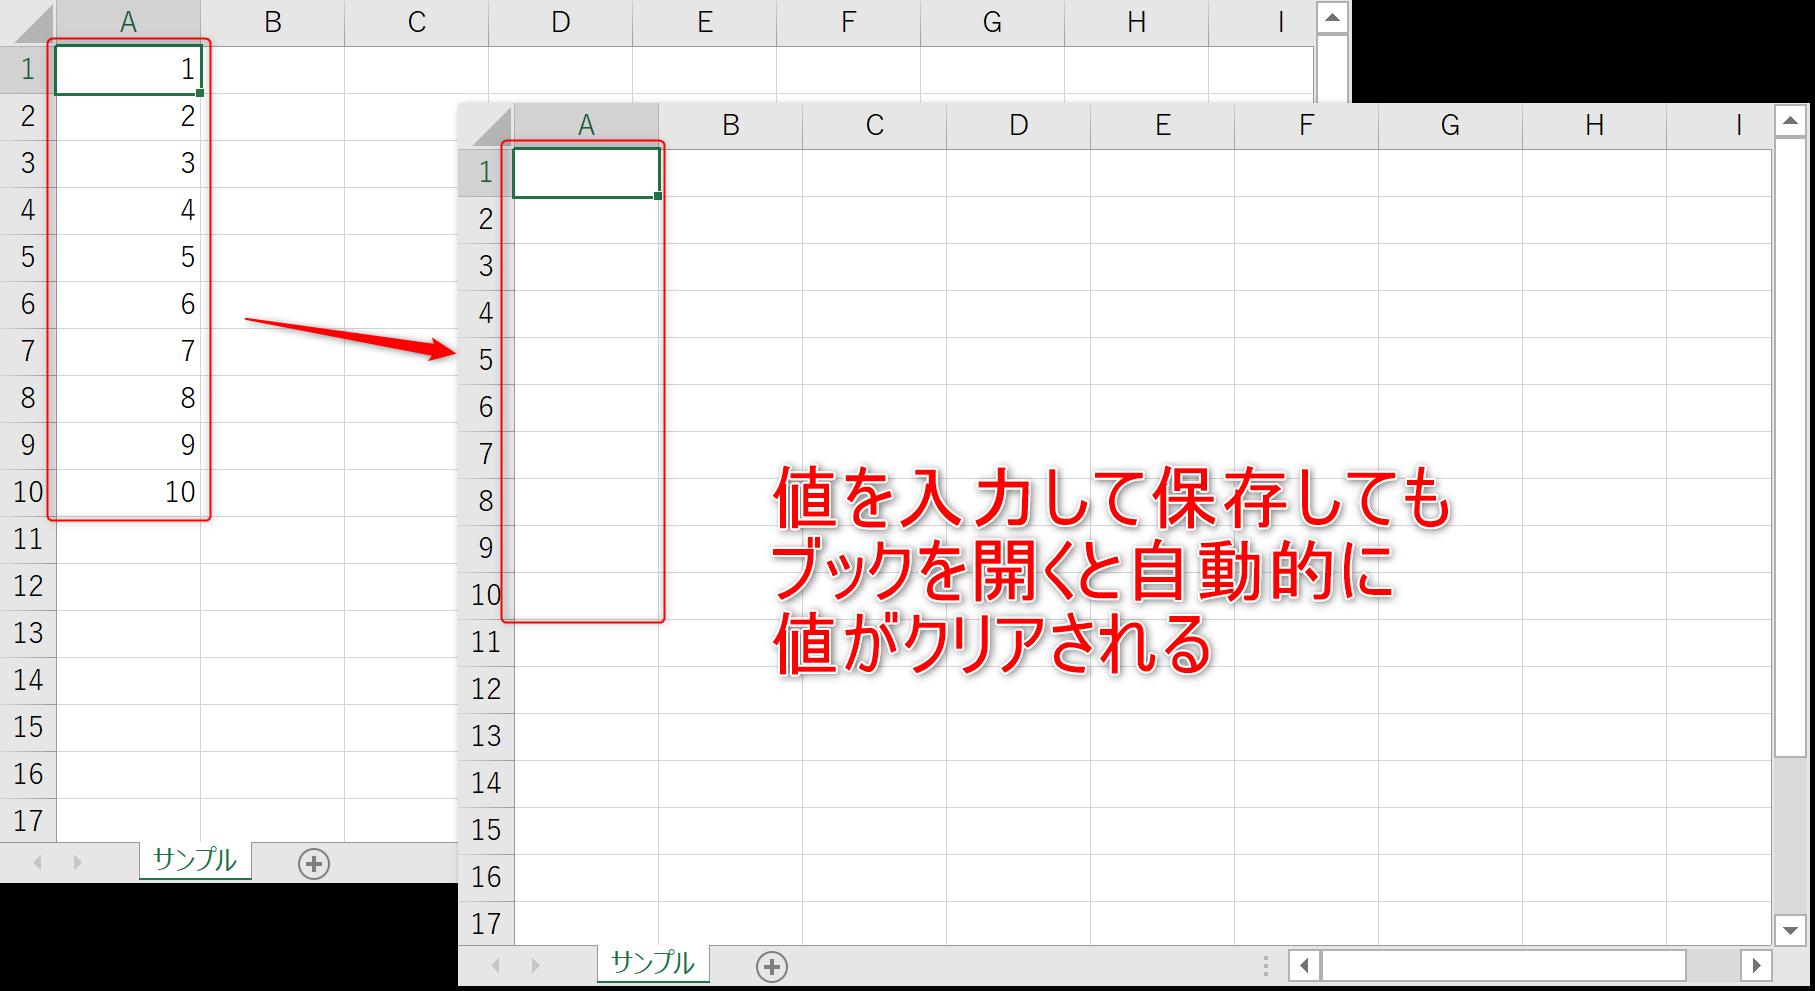 04_VBAWorkbook_Open任意のセル範囲クリアイメージ